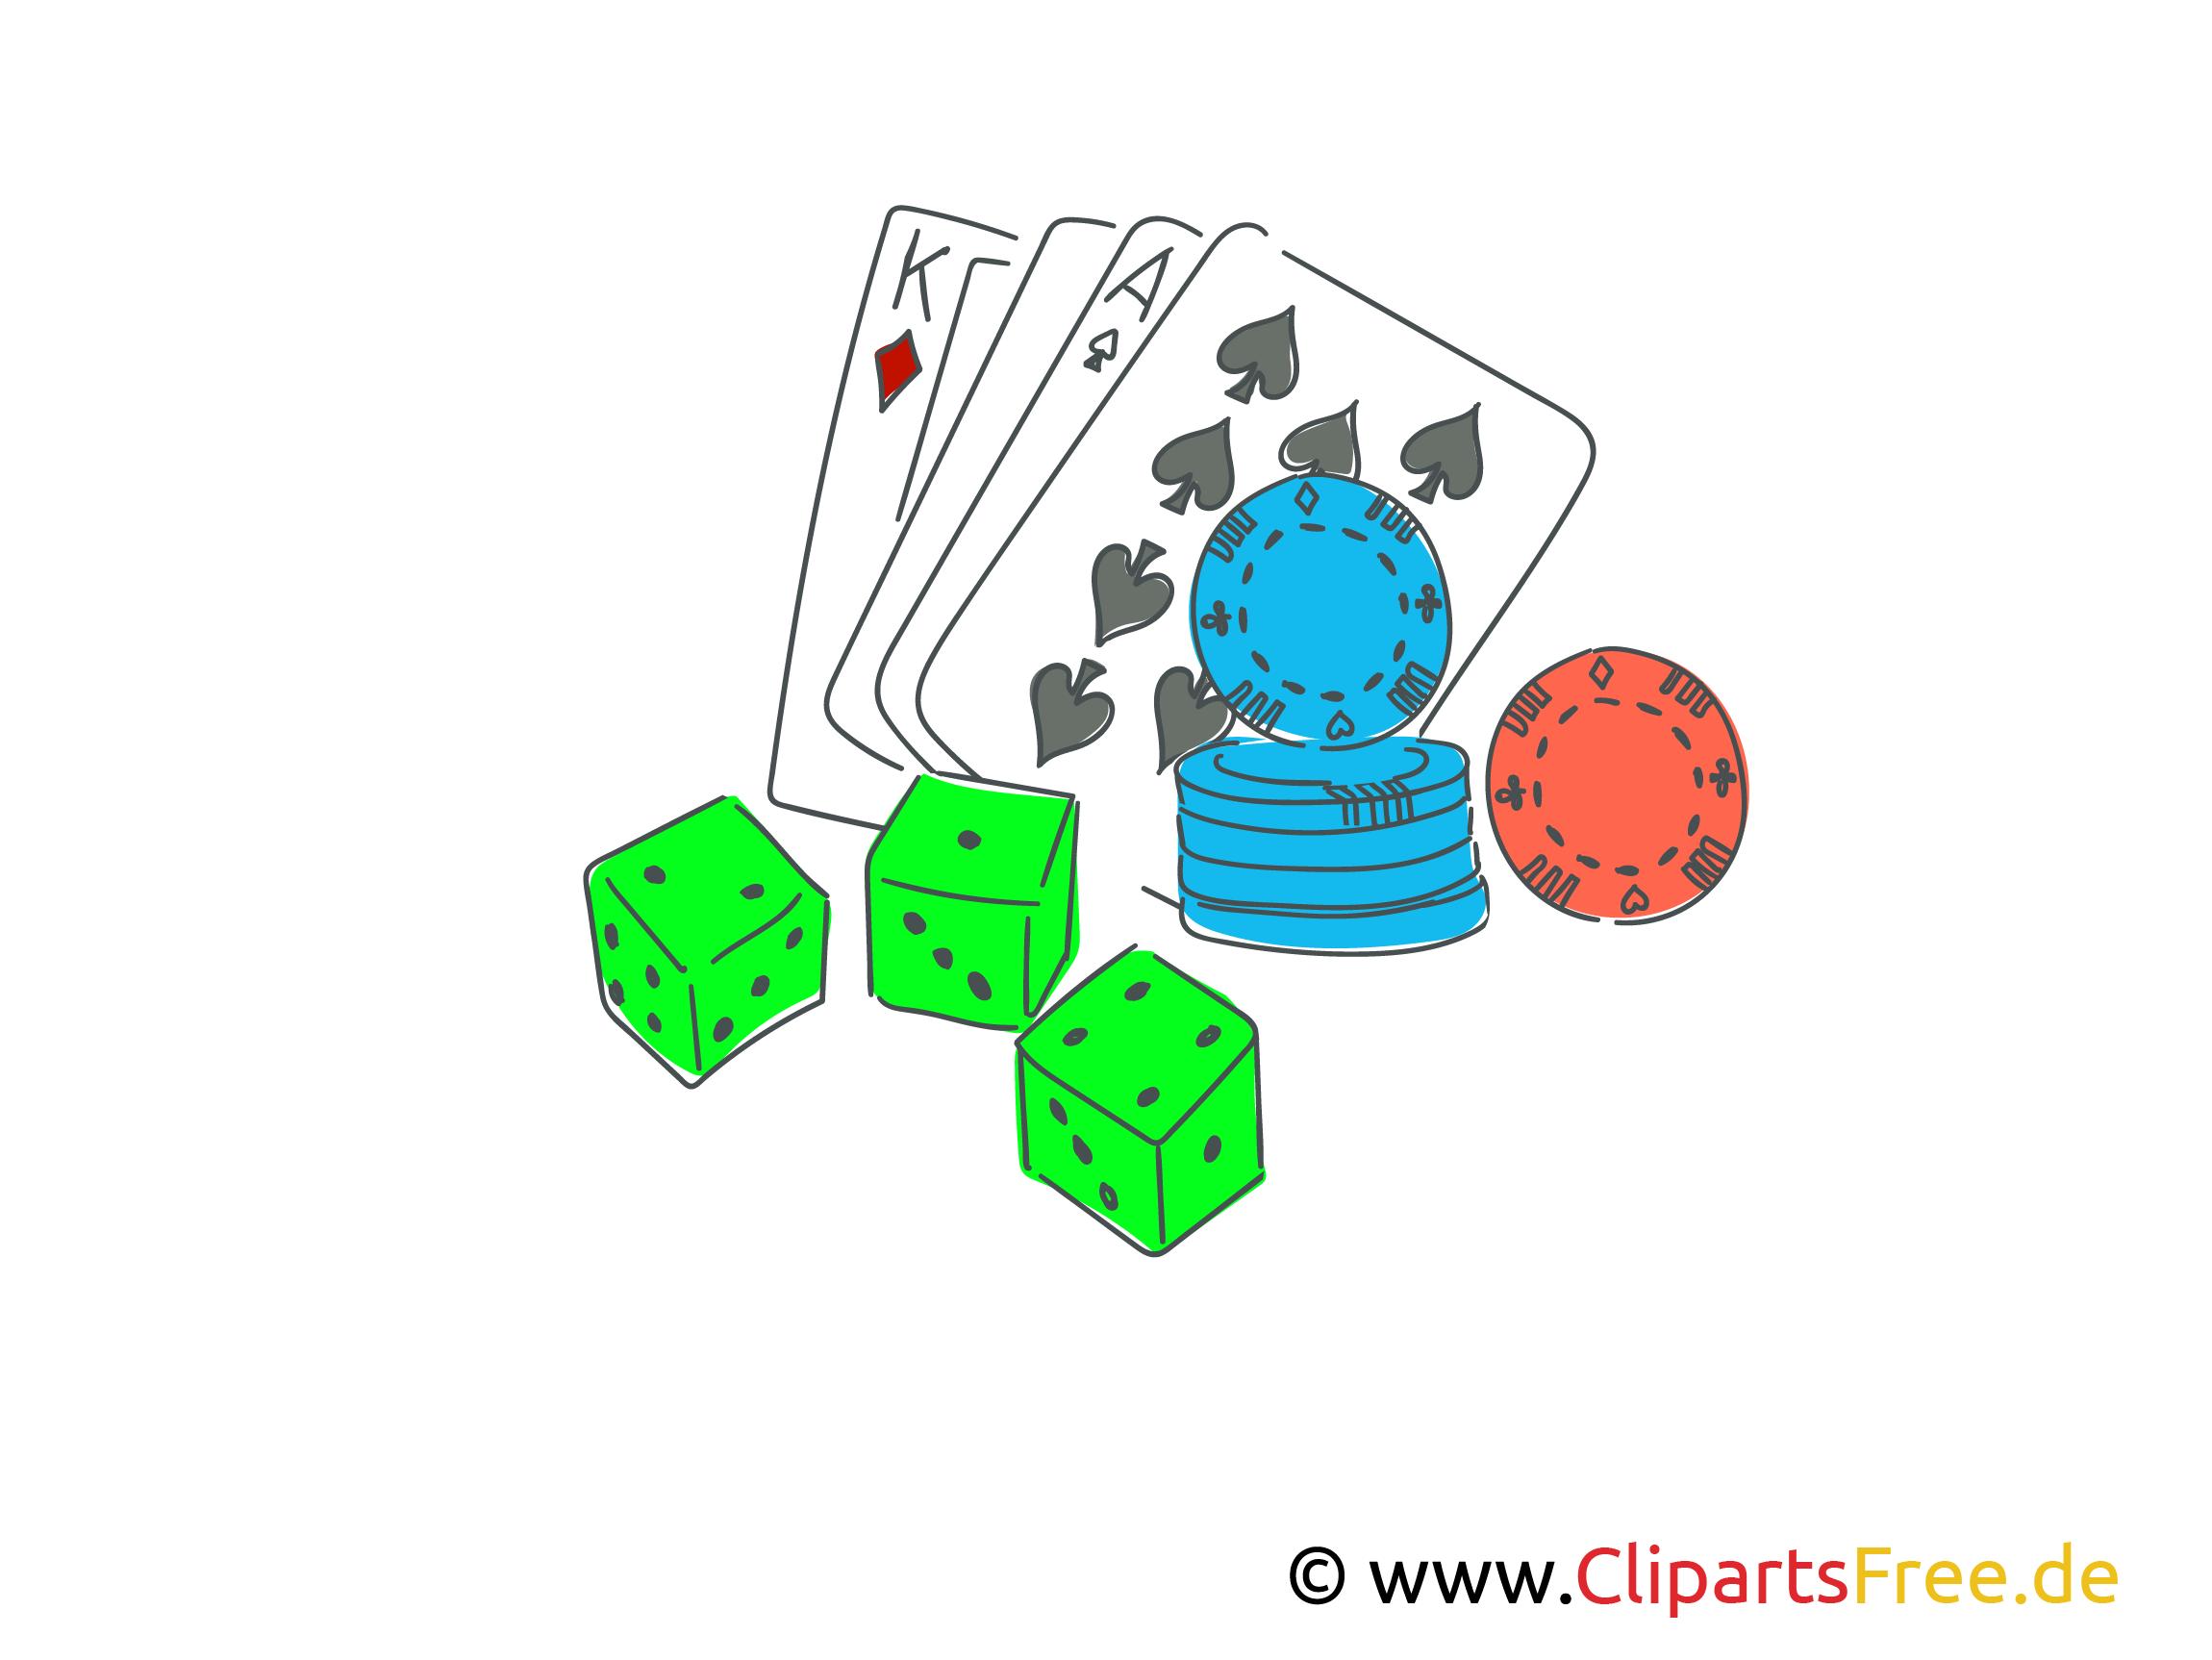 Poker spielen Clipart, Illustration, Bild